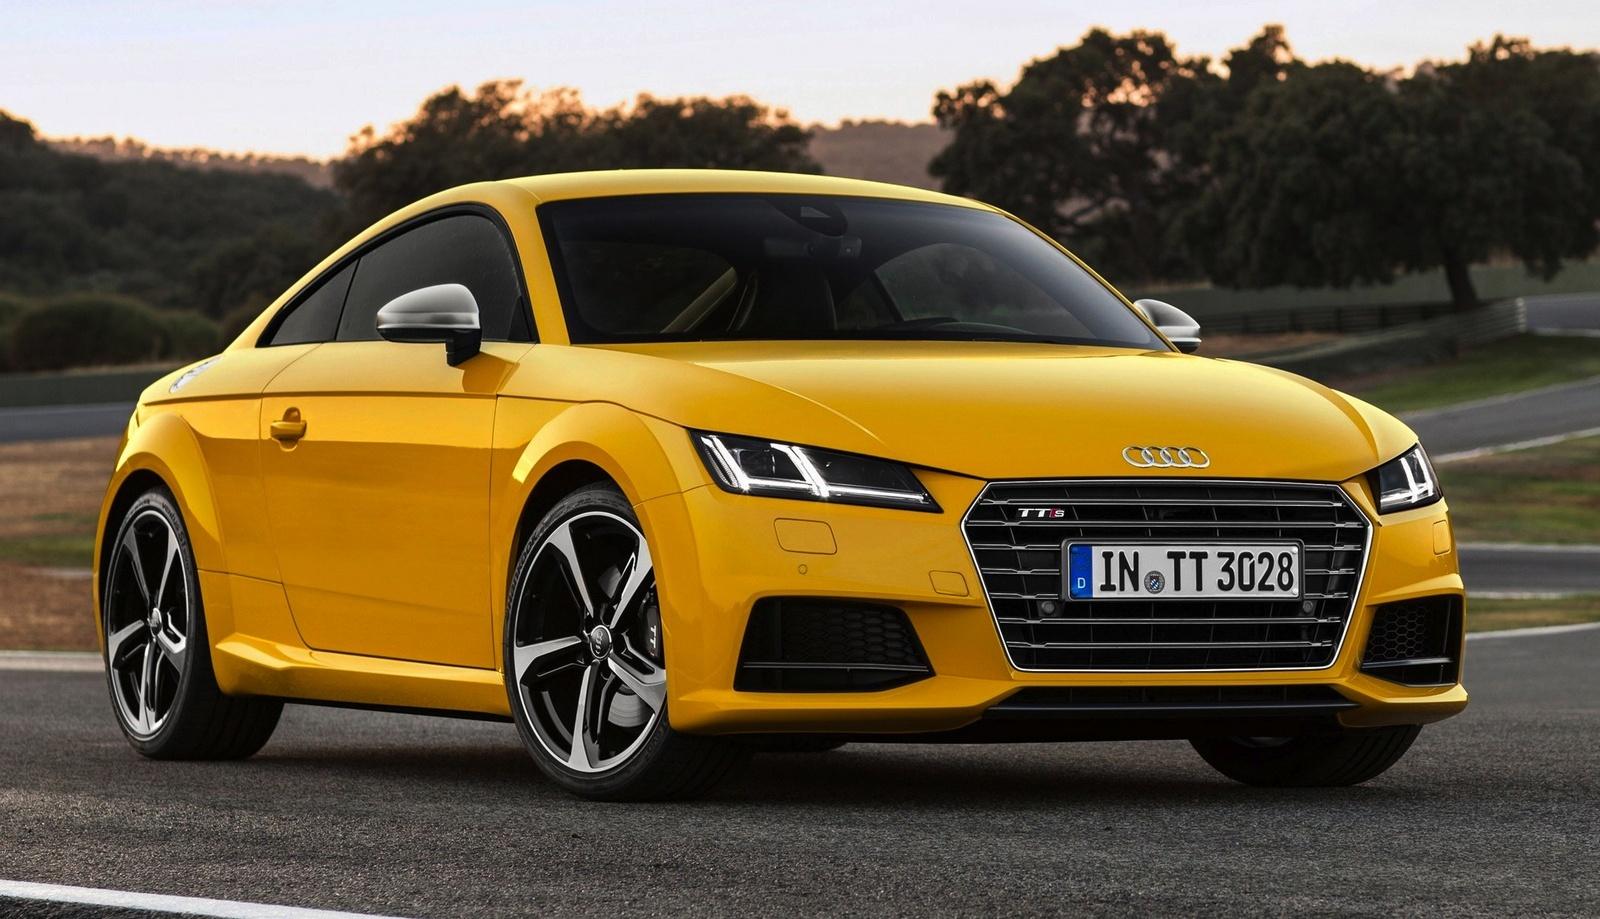 2016 Audi TTS - Review - CarGurus